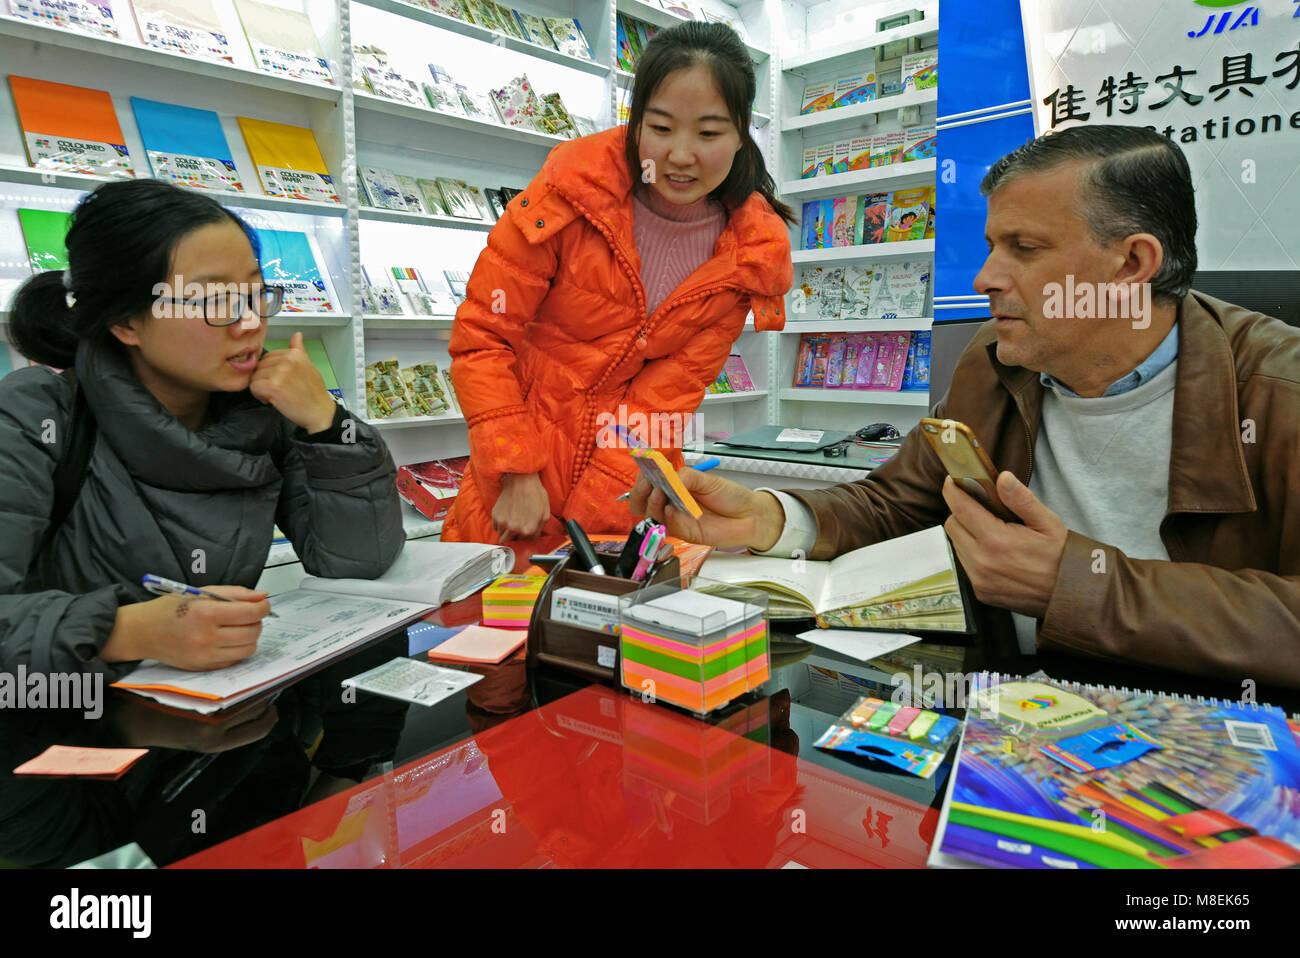 (180317) -- YIWU, Marzo 17, 2018 (Xinhua) -- imprenditore pakistano Yousef Hamurerwi (1t R) seleziona stationeries Immagini Stock